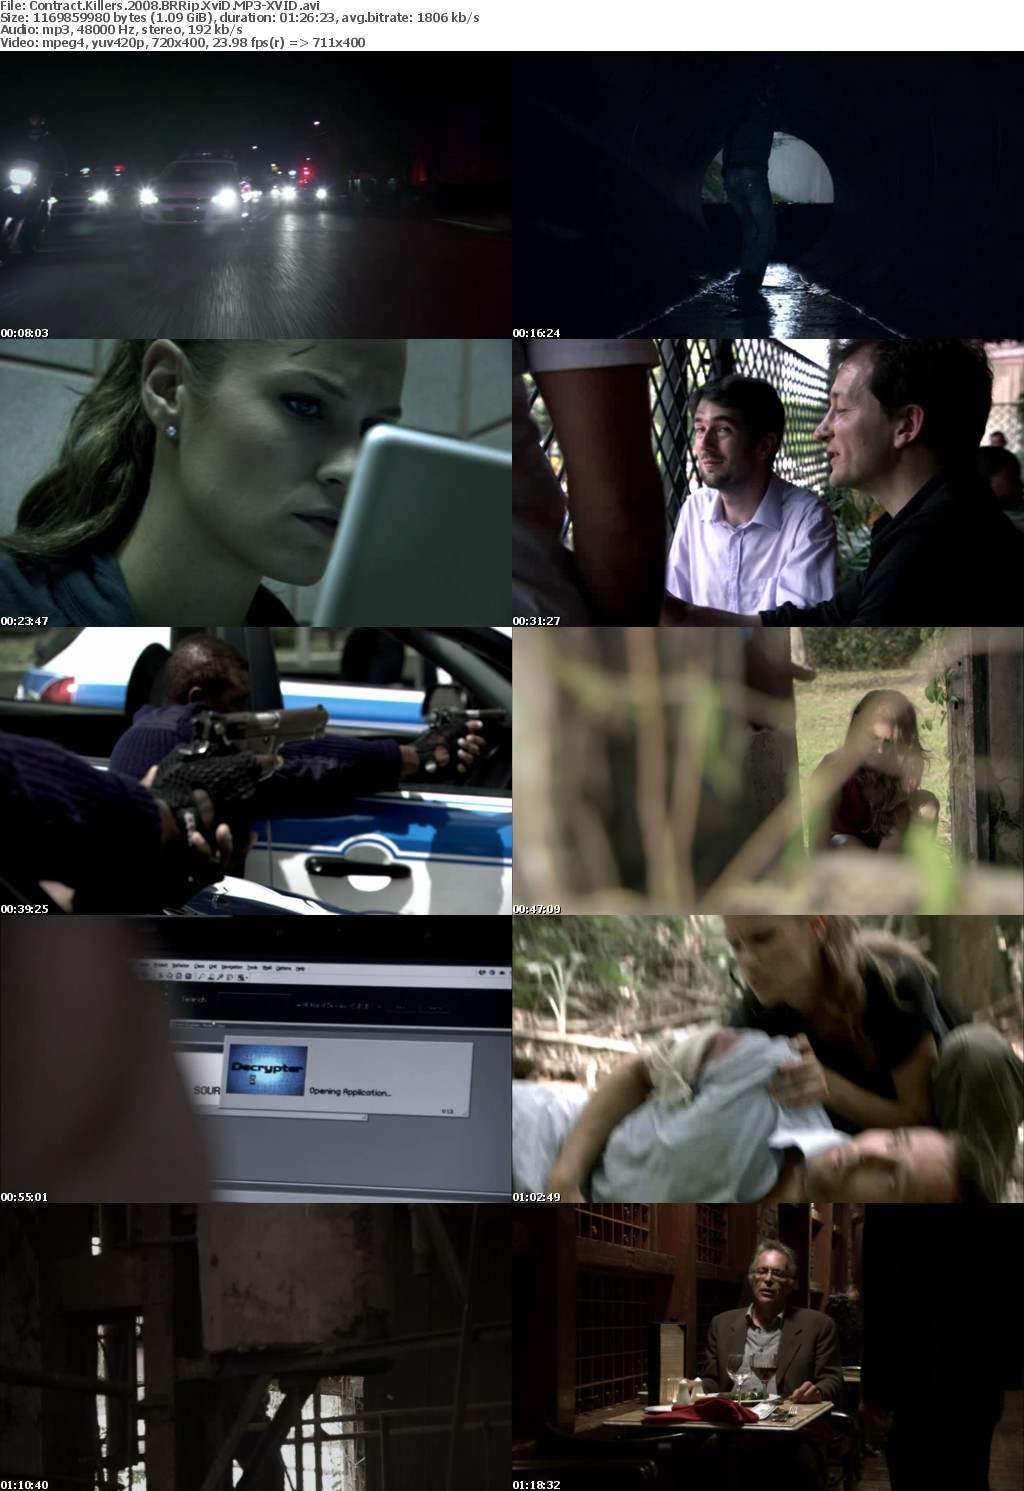 Contract Killers 2008 BRRip XviD MP3-XVID